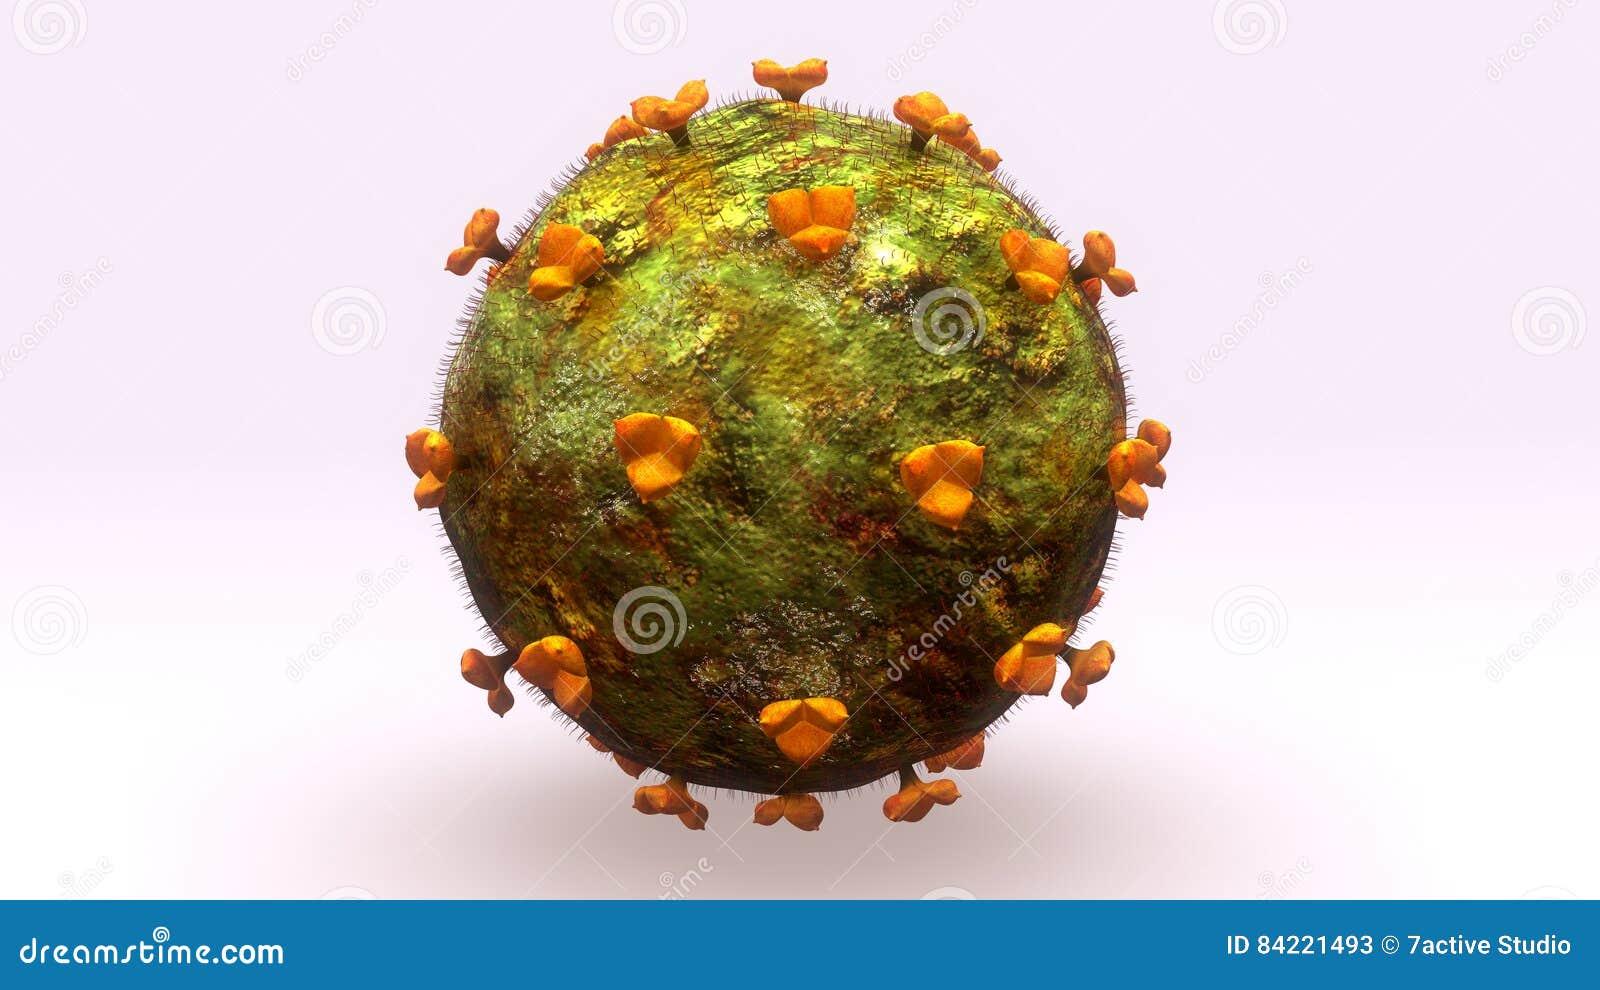 HIV Virus stock illustration. Illustration of microscopic - 84221493